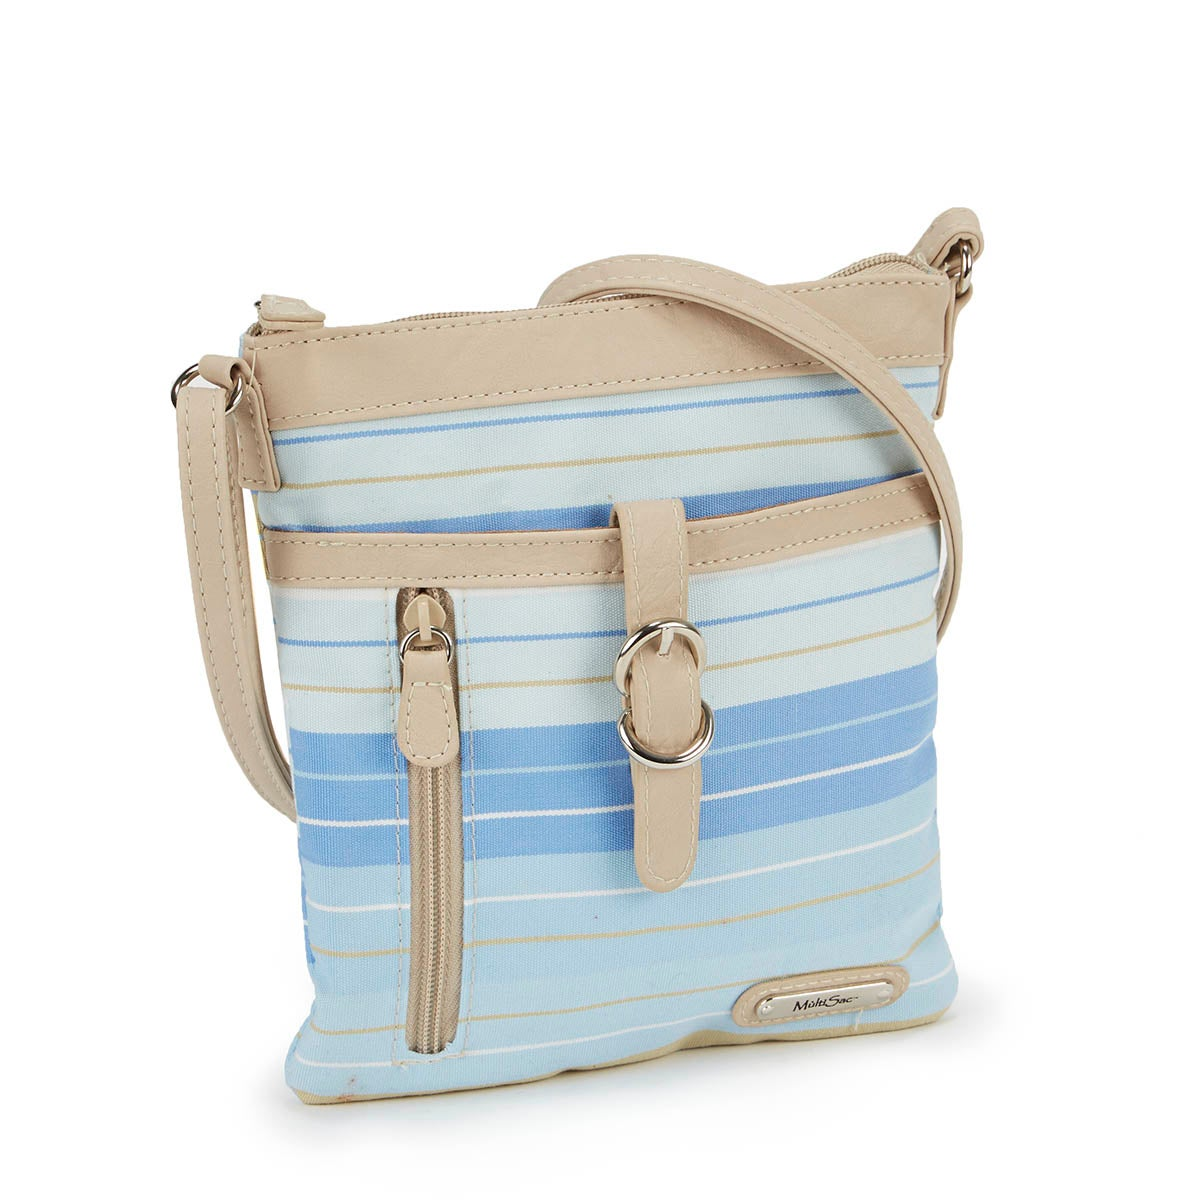 Lds blue/chino mini cross body bag